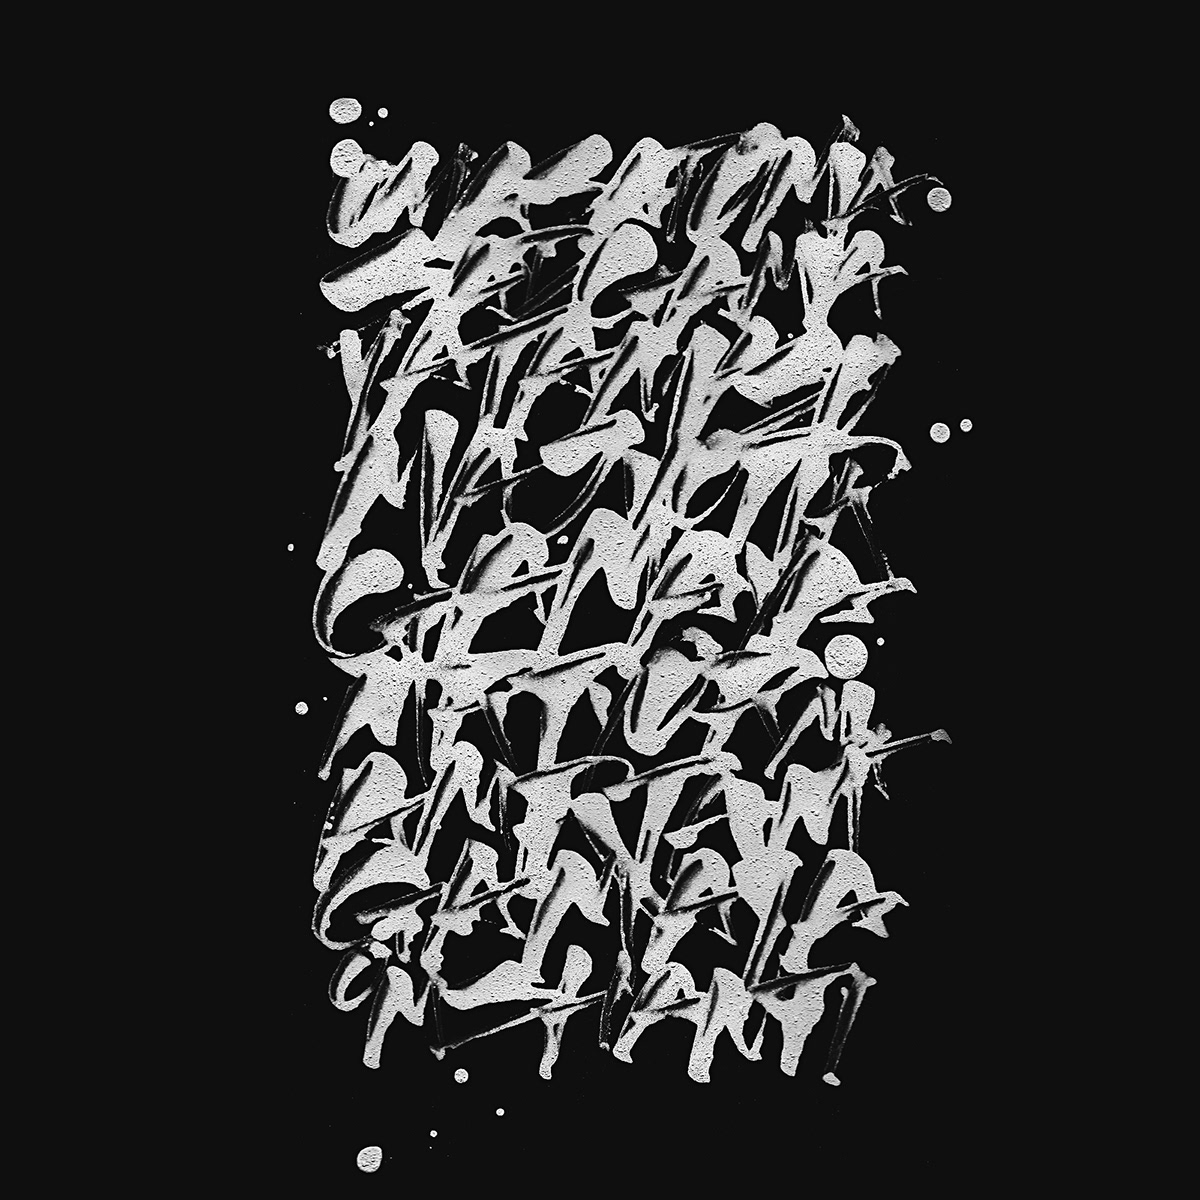 Calligraphy   lettering graphic design  handmade type logo sign words art